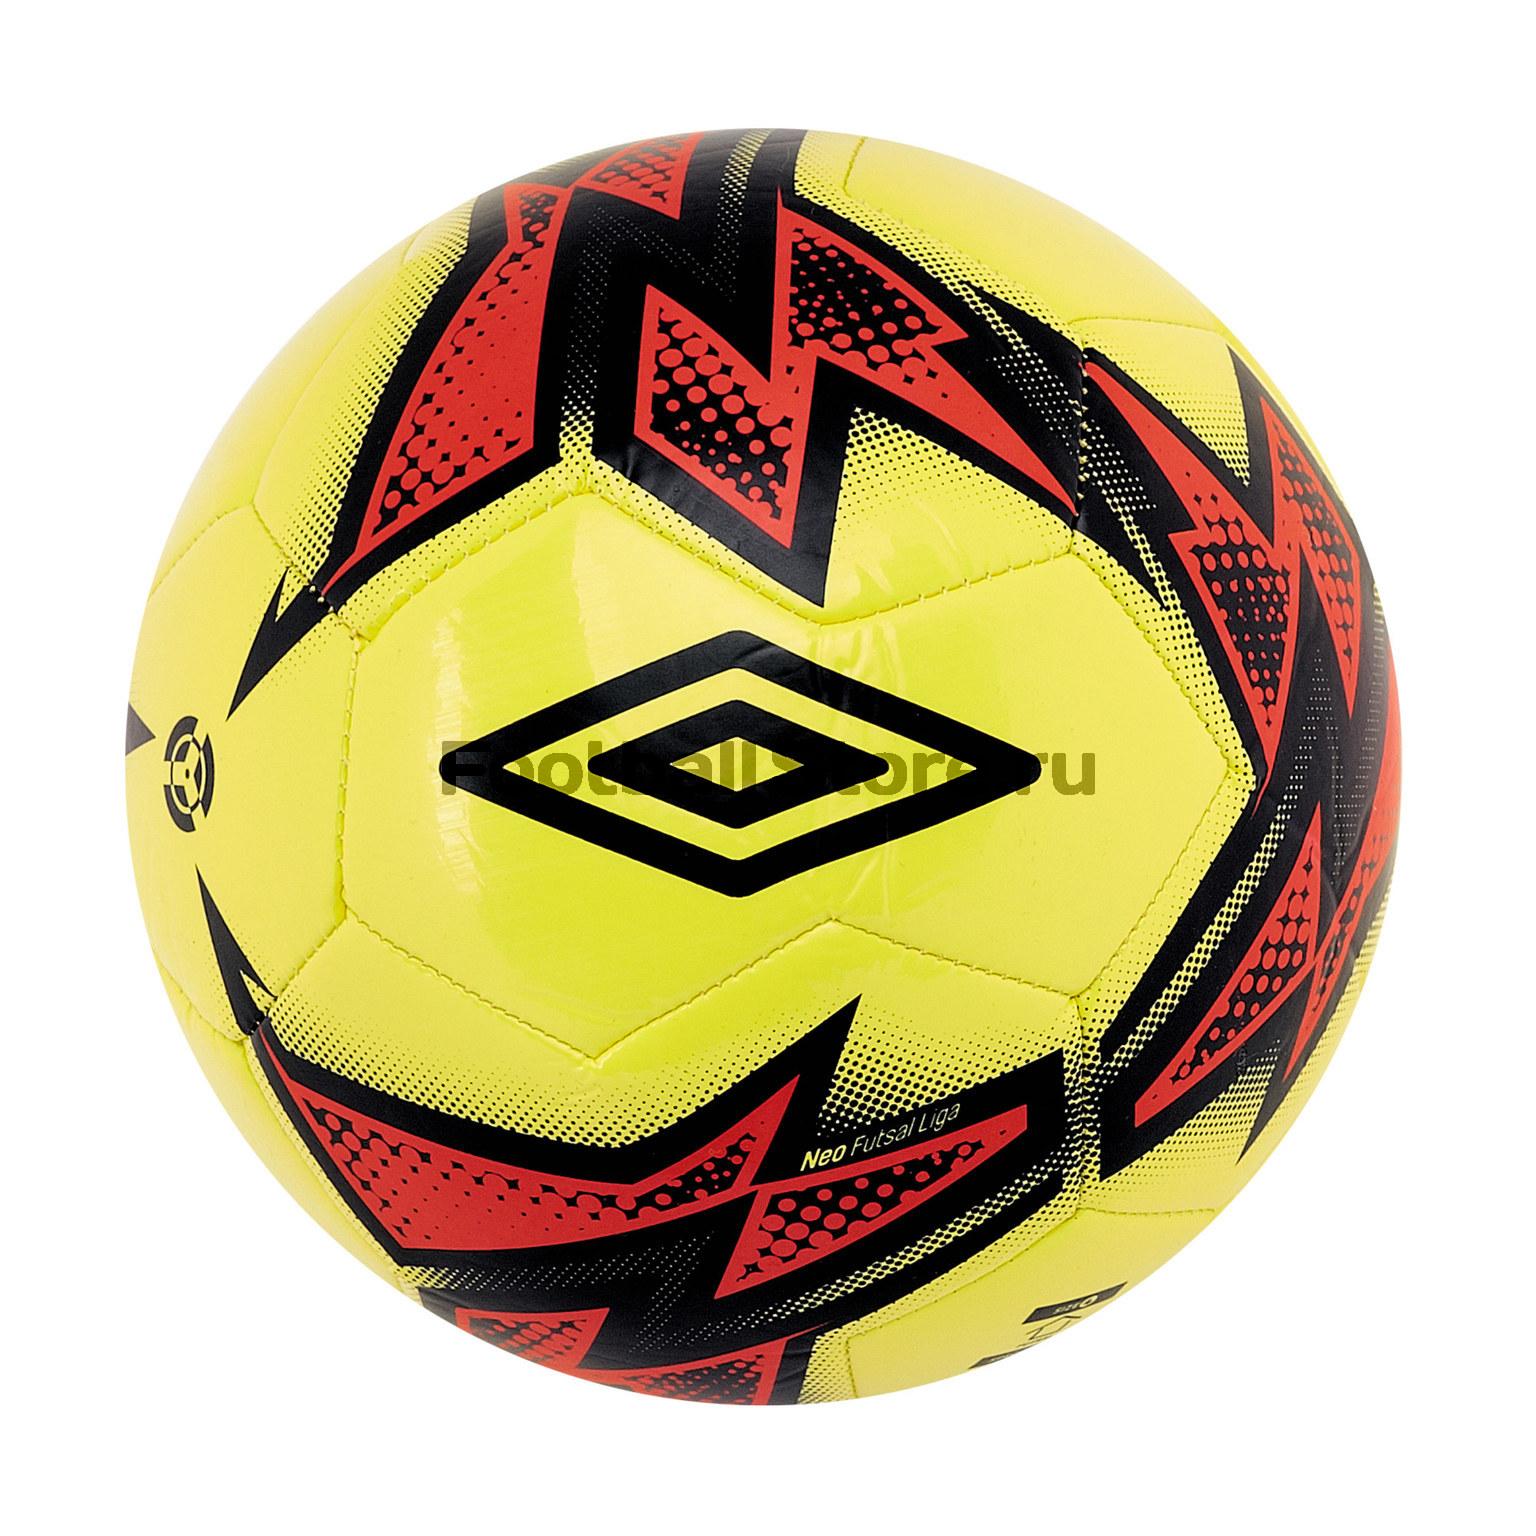 Футзальный мяч Umbro Neo Liga 20871U мяч футзальный любительский р 4 umbro neo futsal liga 20871u fcy